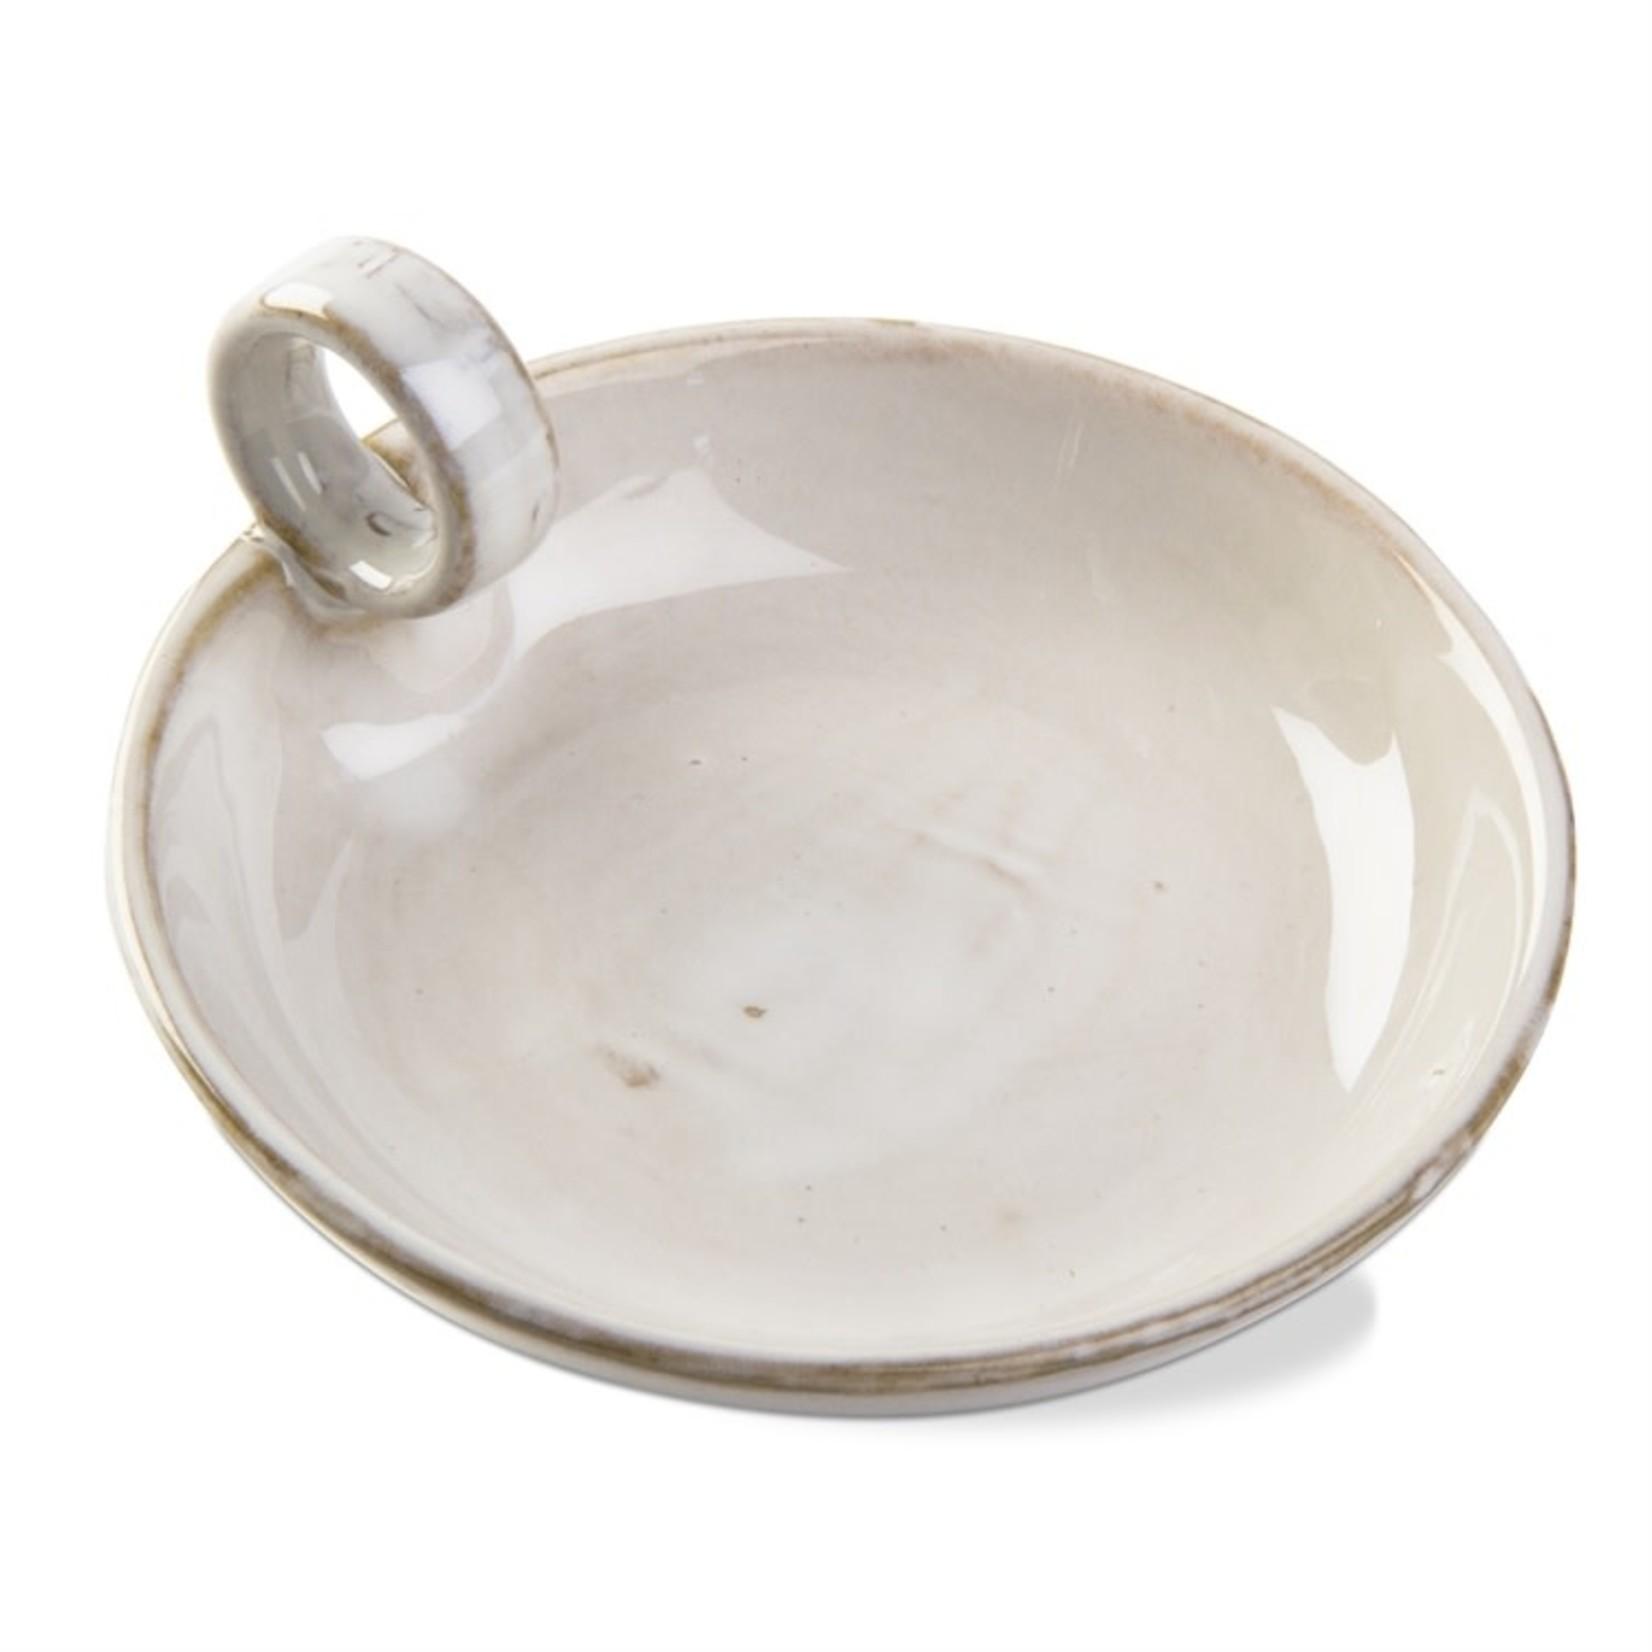 Candleholder Plate Ivory